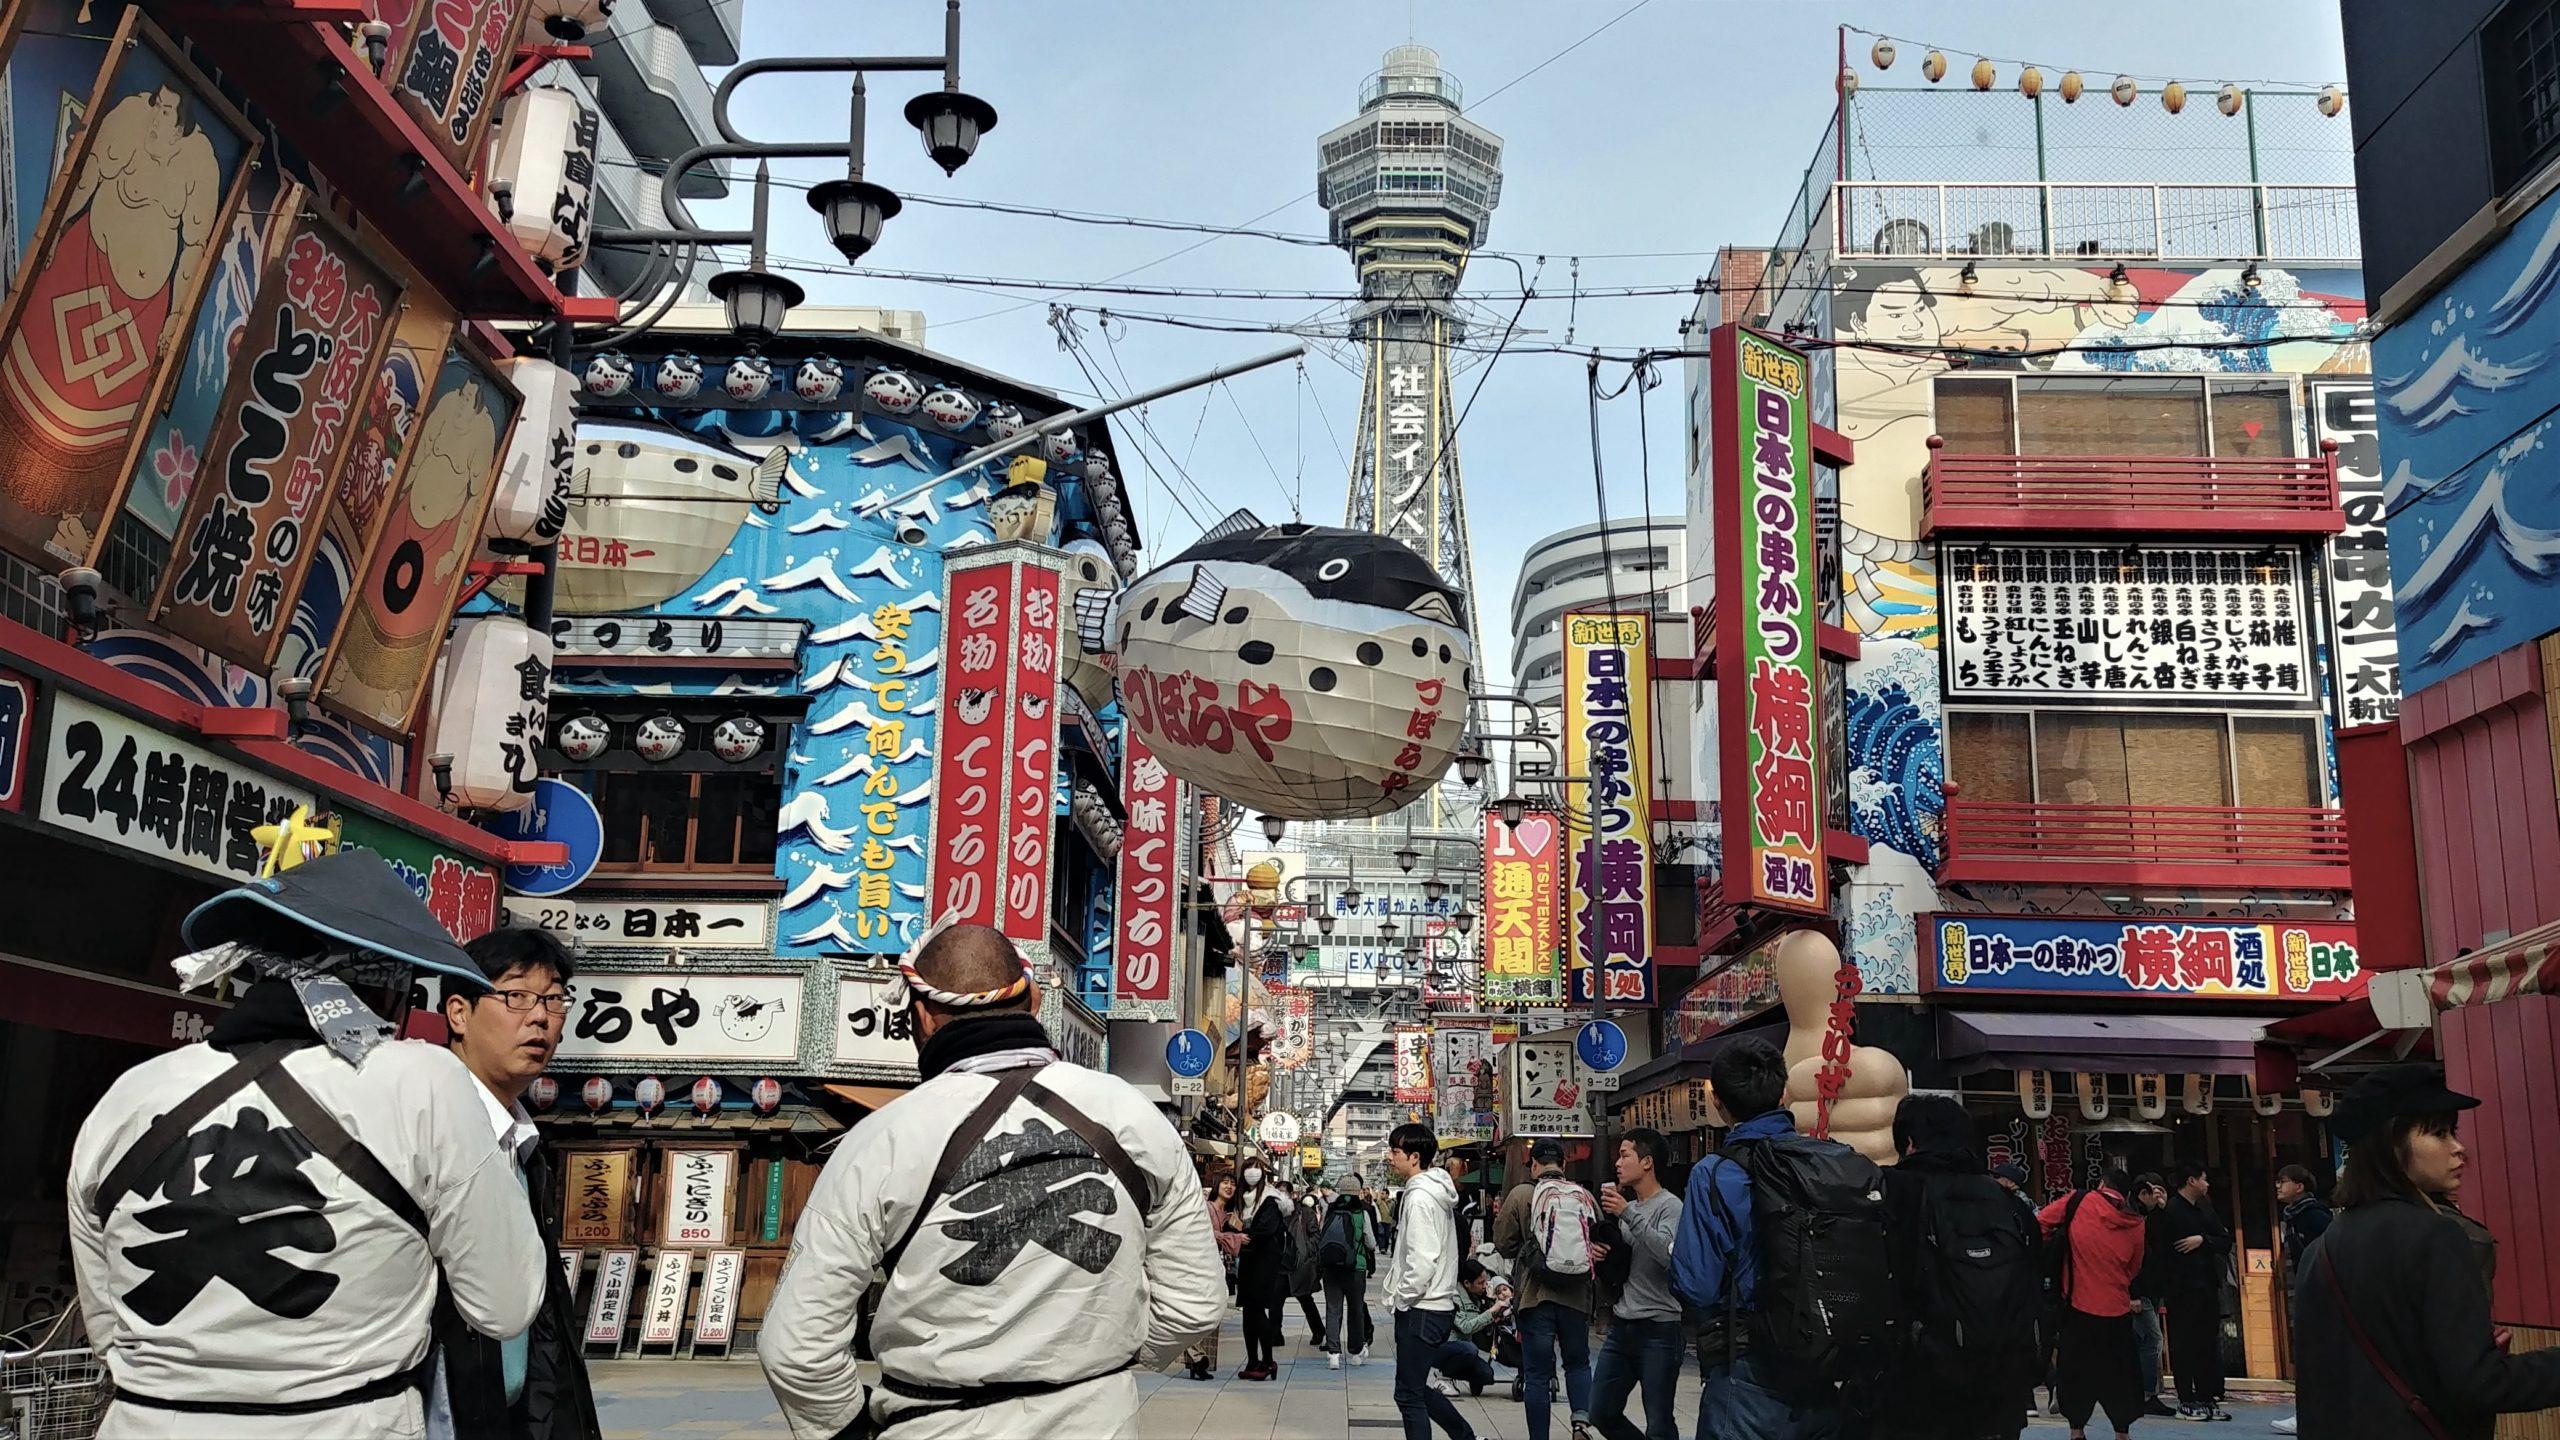 osaka shinsekai visiter infos pratiques blog voyage japon arpenter le chemin